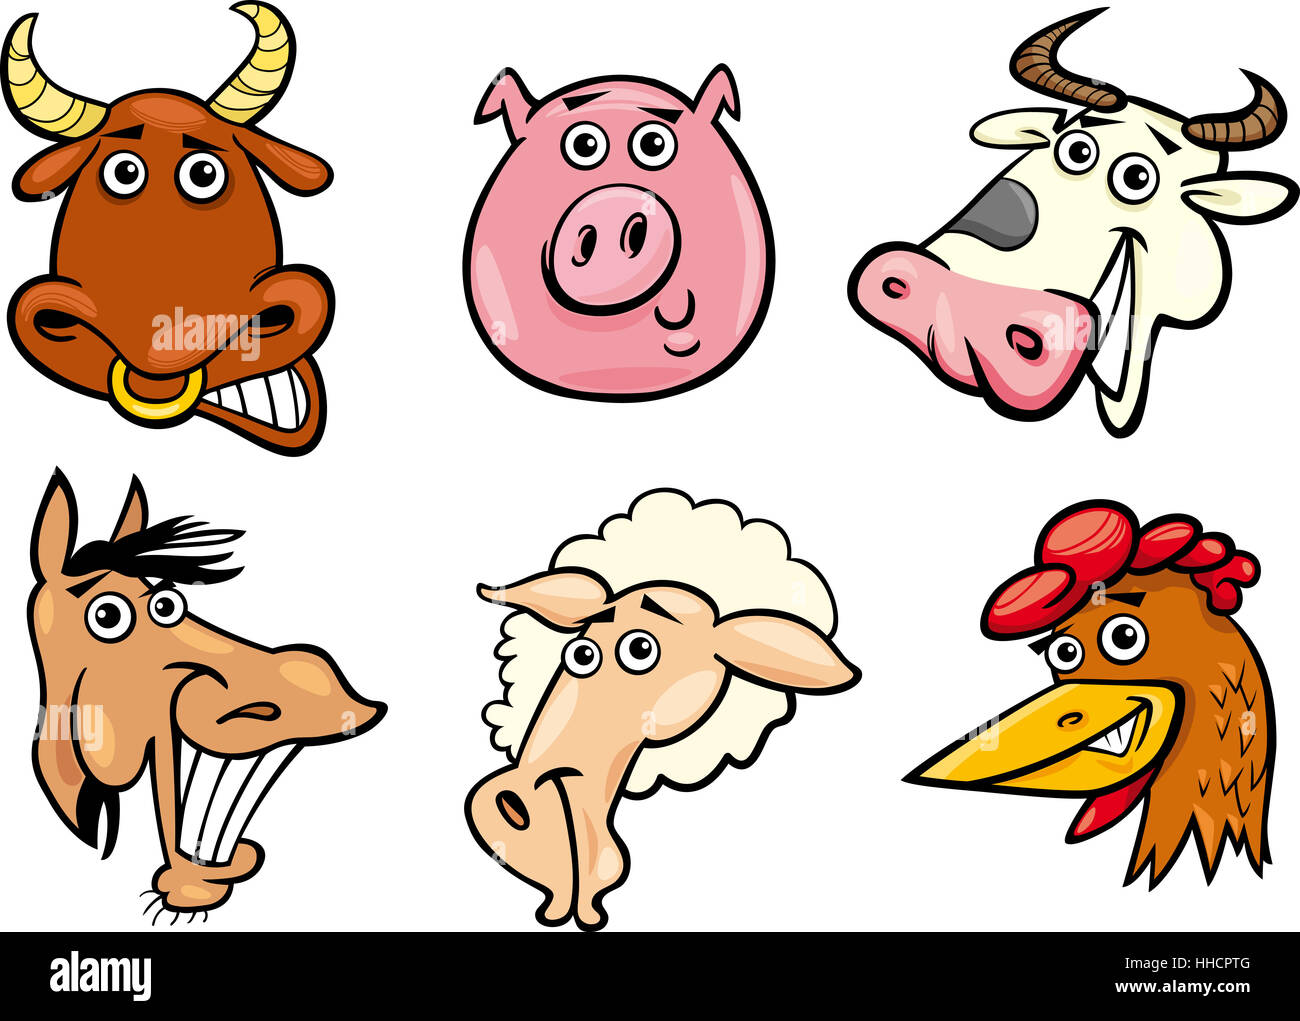 Cartoon Illustration De Différents Animaux Rigolos De La